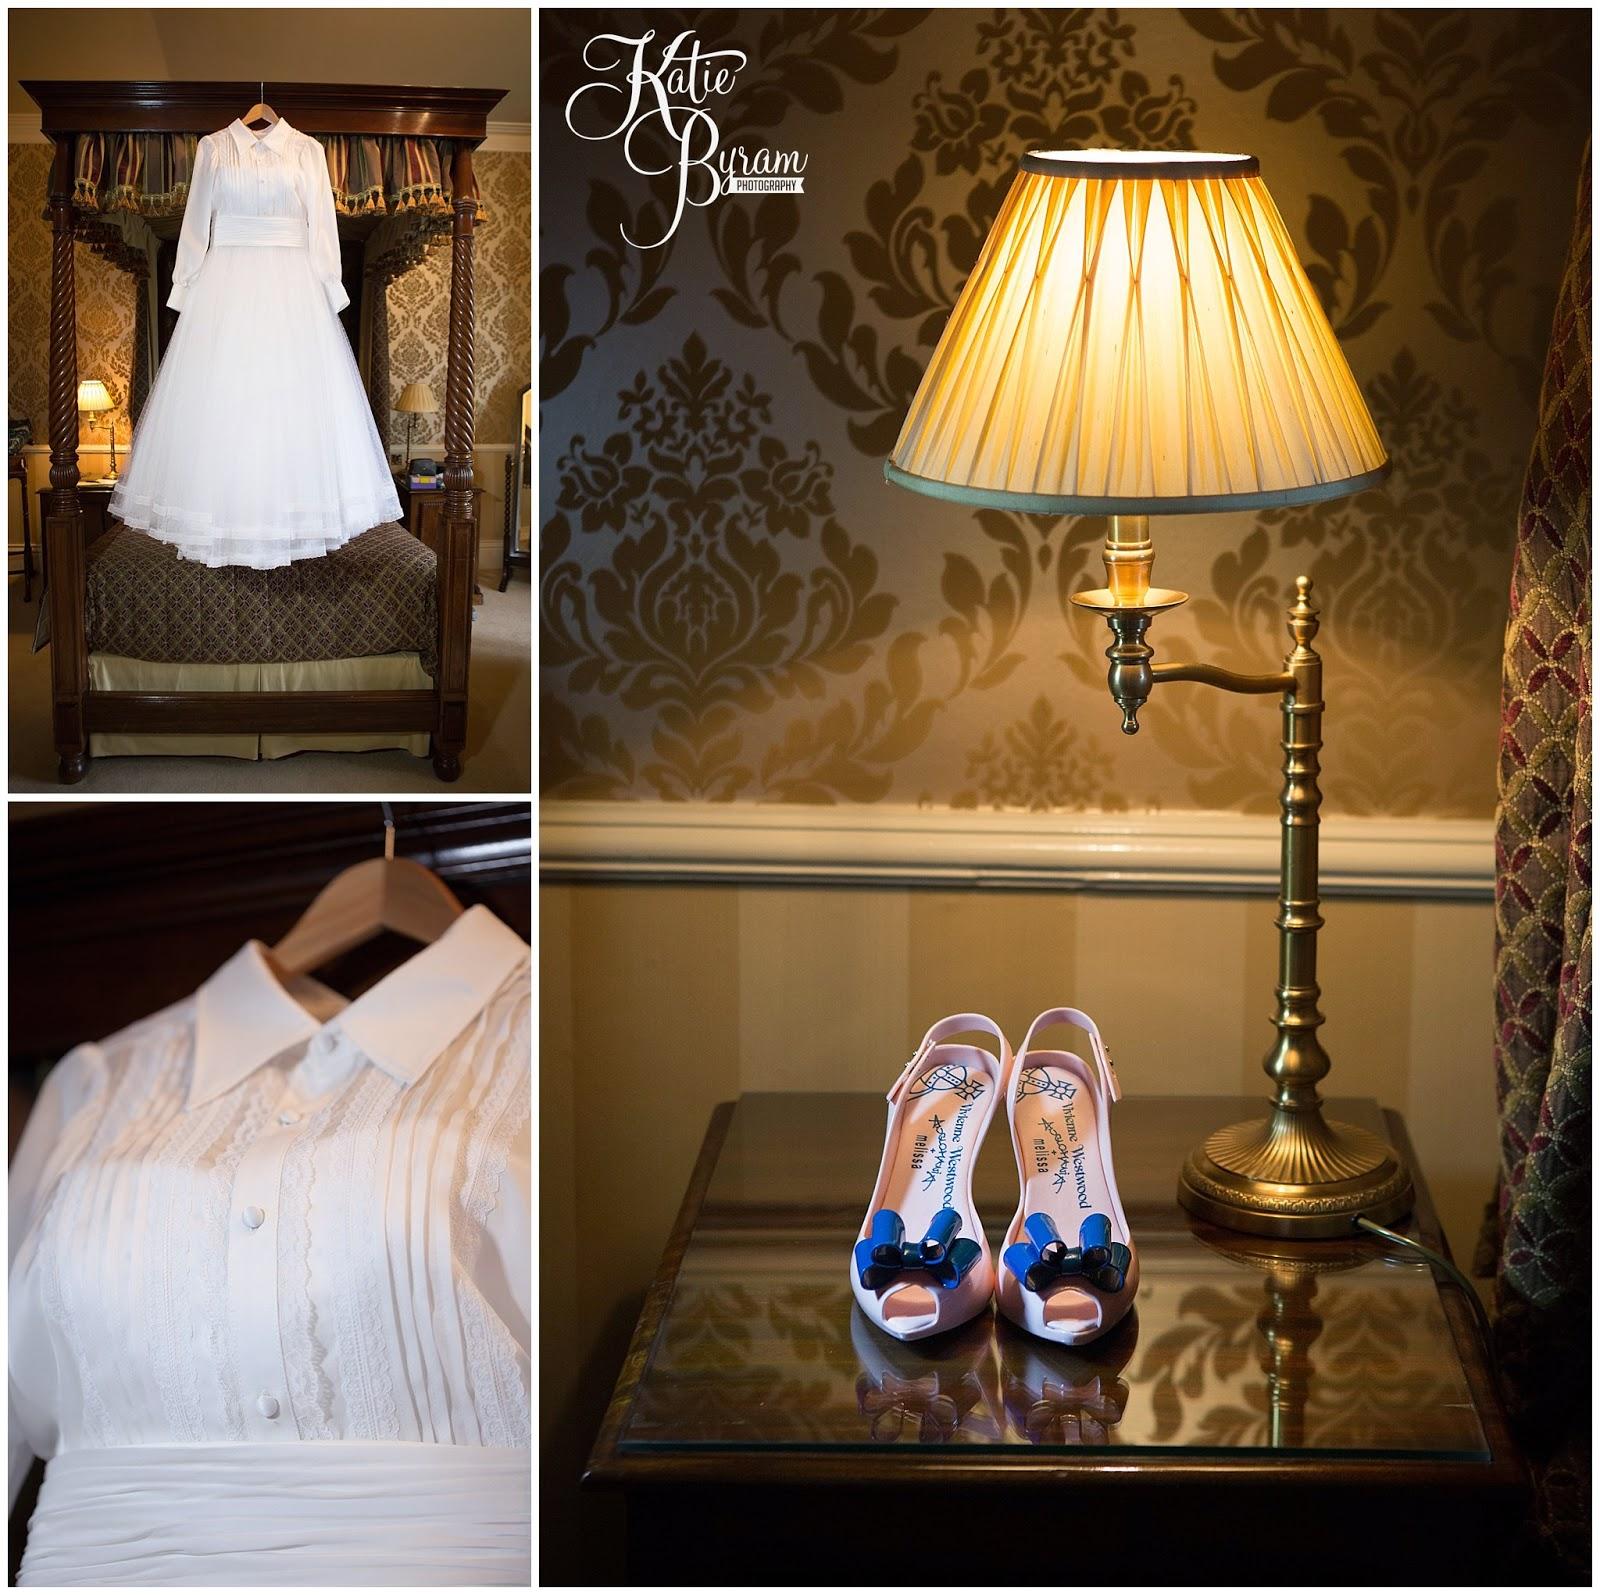 mia bridal, mia bridal carlisle, vintage wedding dress, victorian wedding dress, wedding dress belt, vivienne westwood shoes